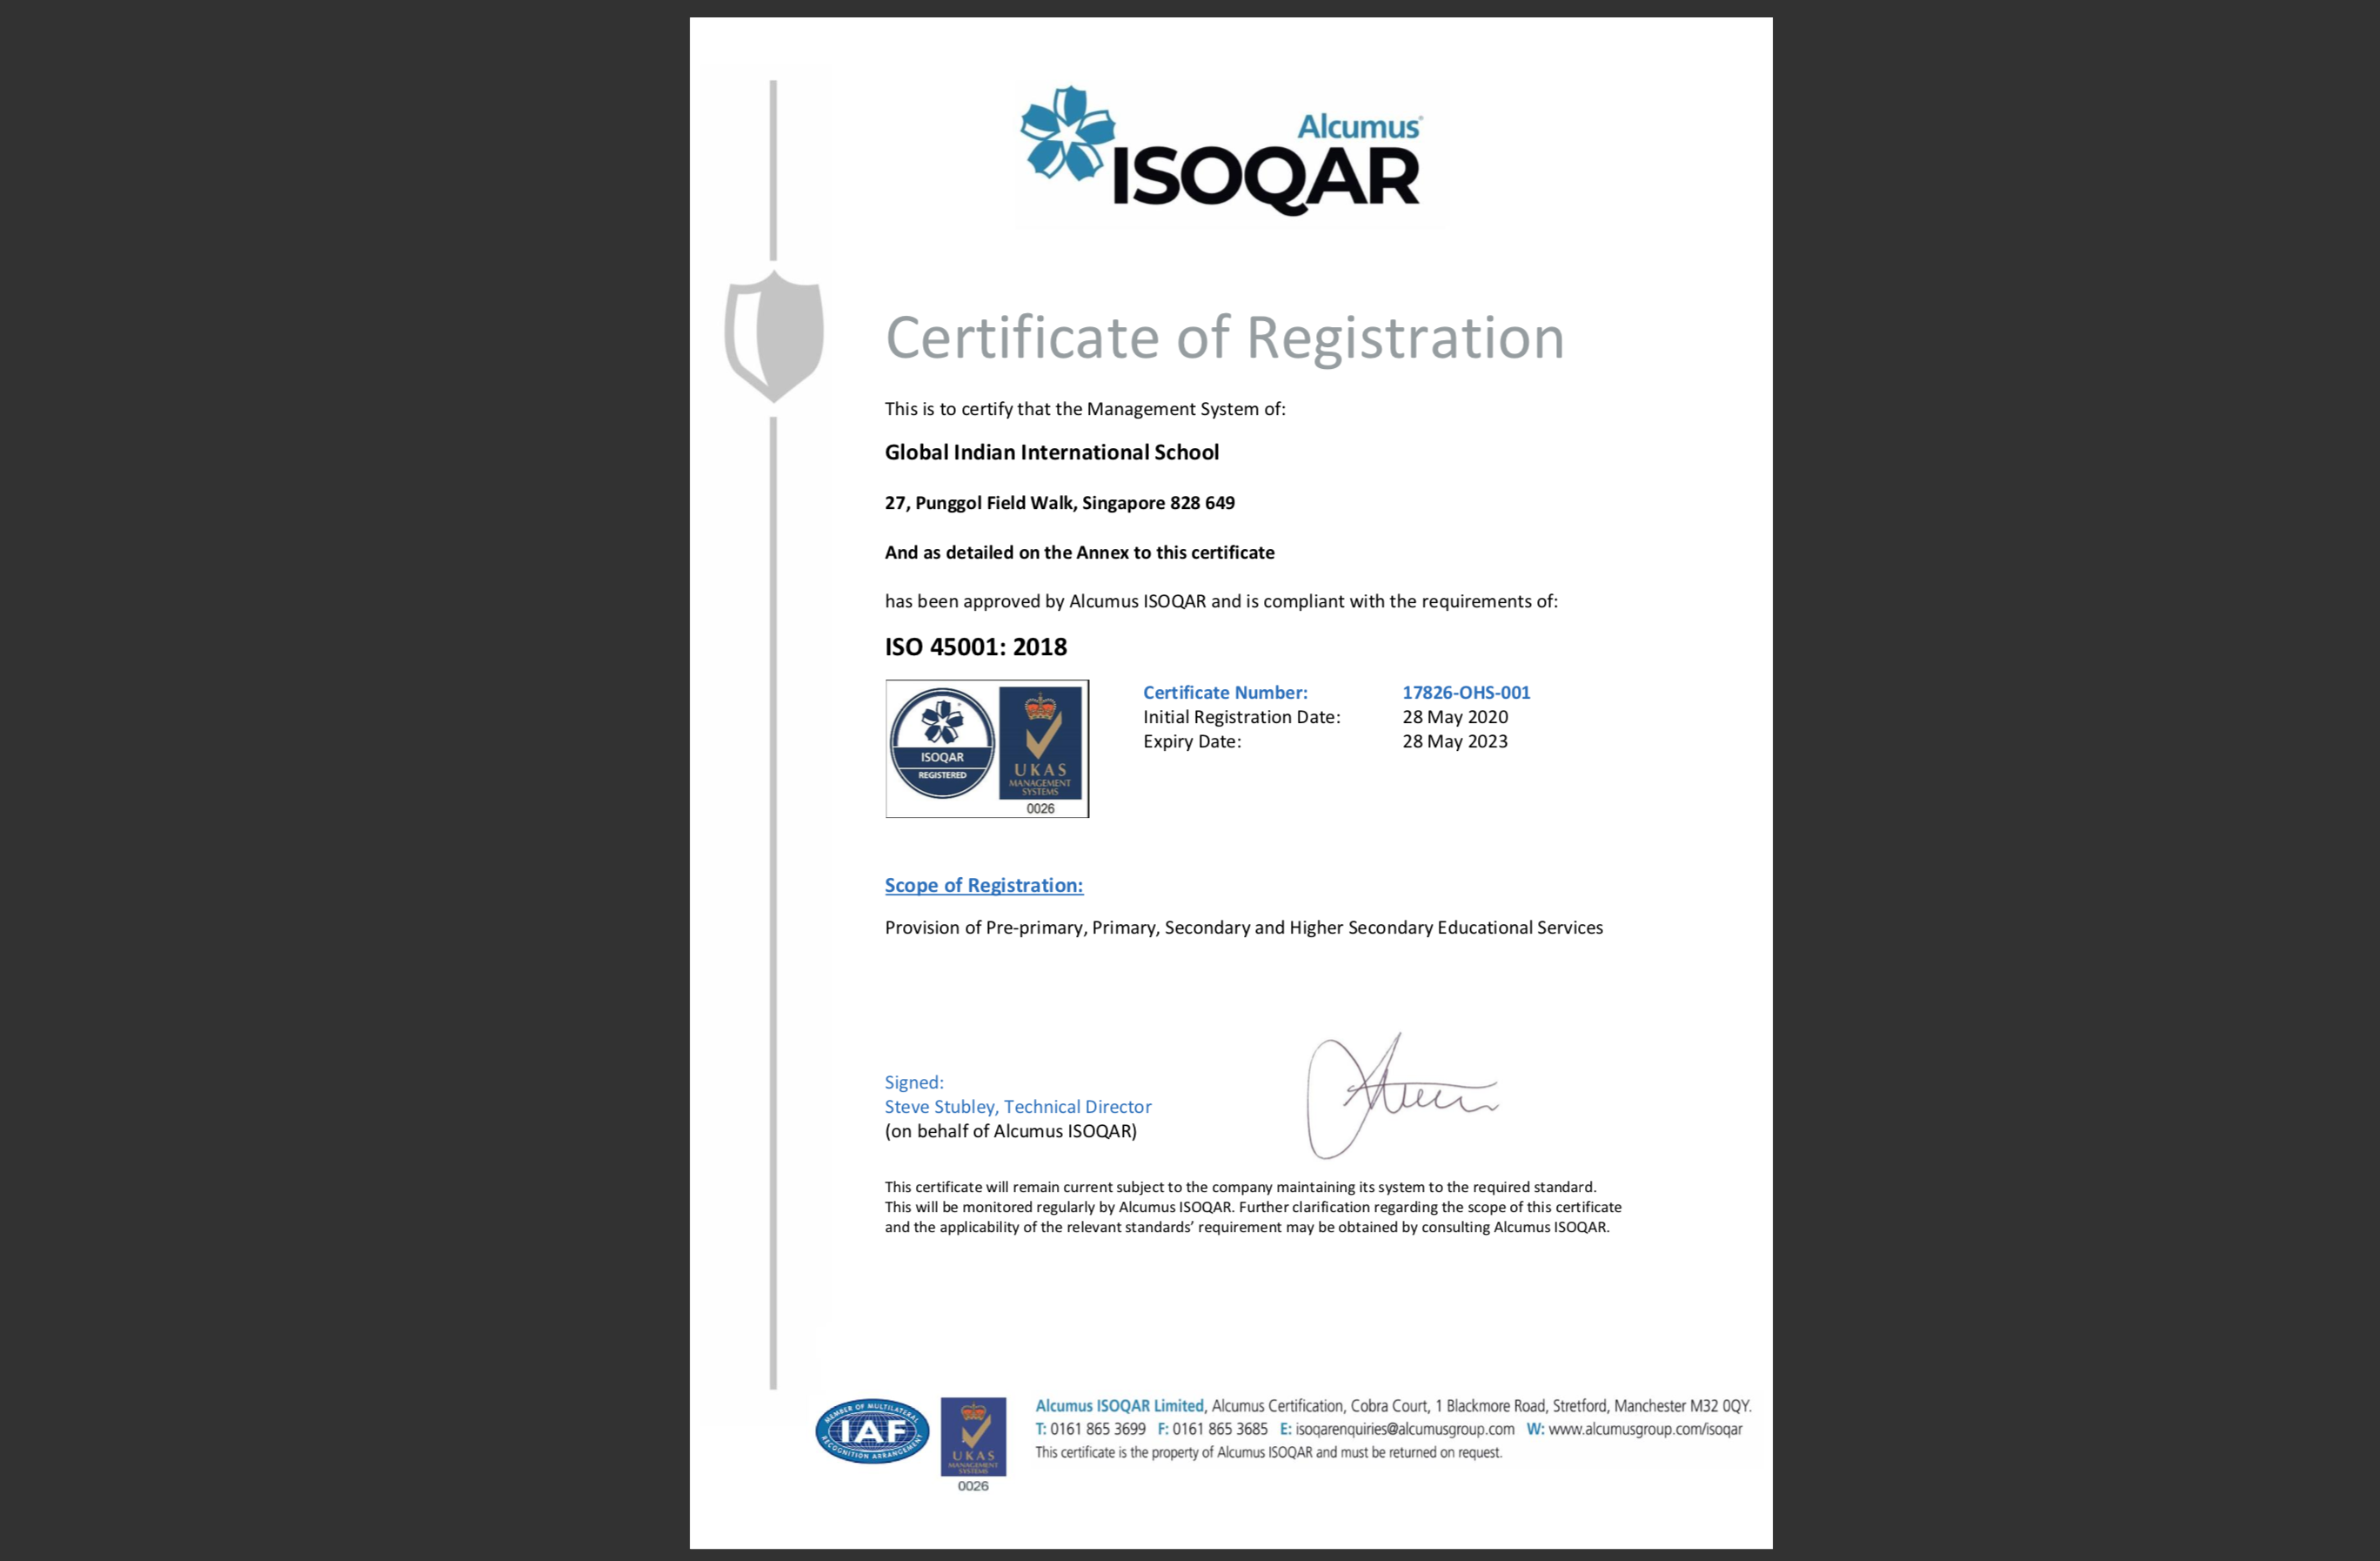 GIIS_ISO Certification